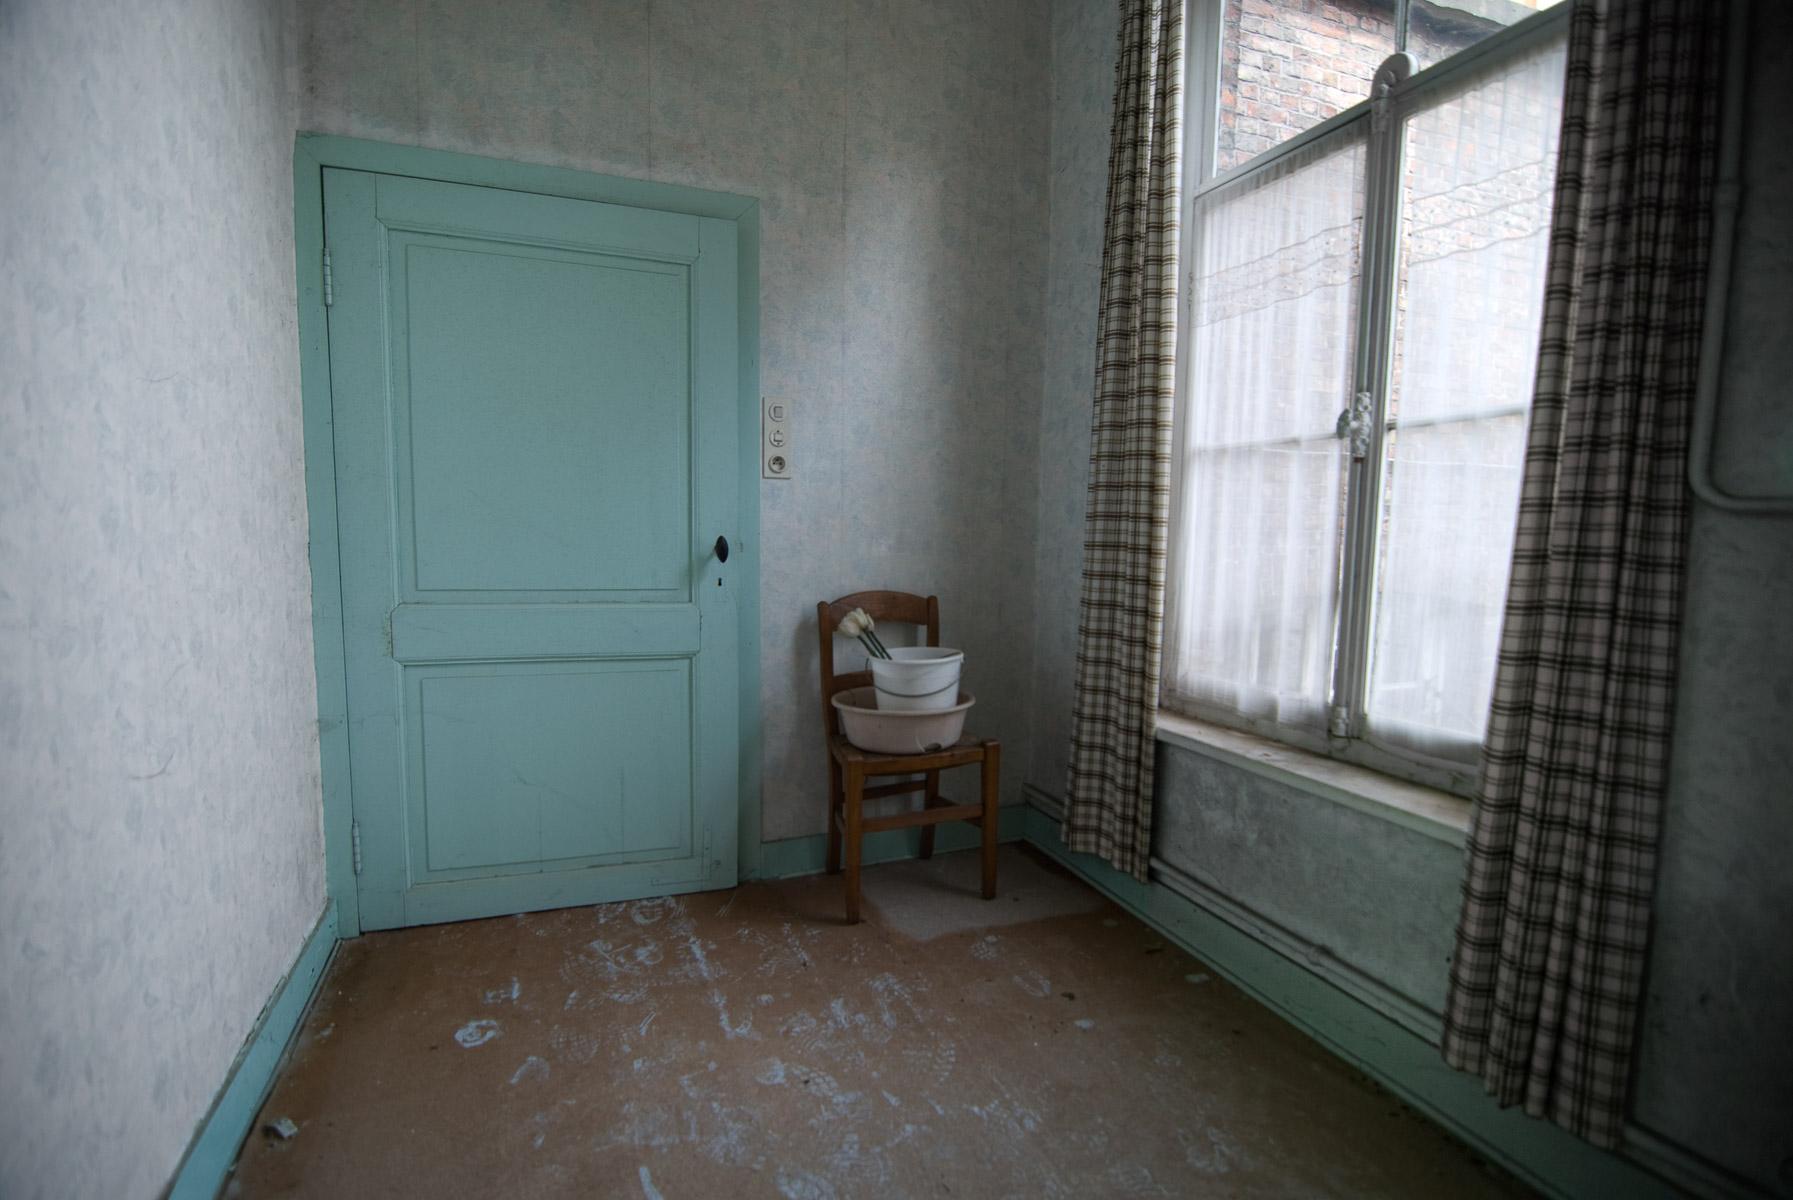 abandoned-places-in-belgium-alicia-rius-photography-3.jpg